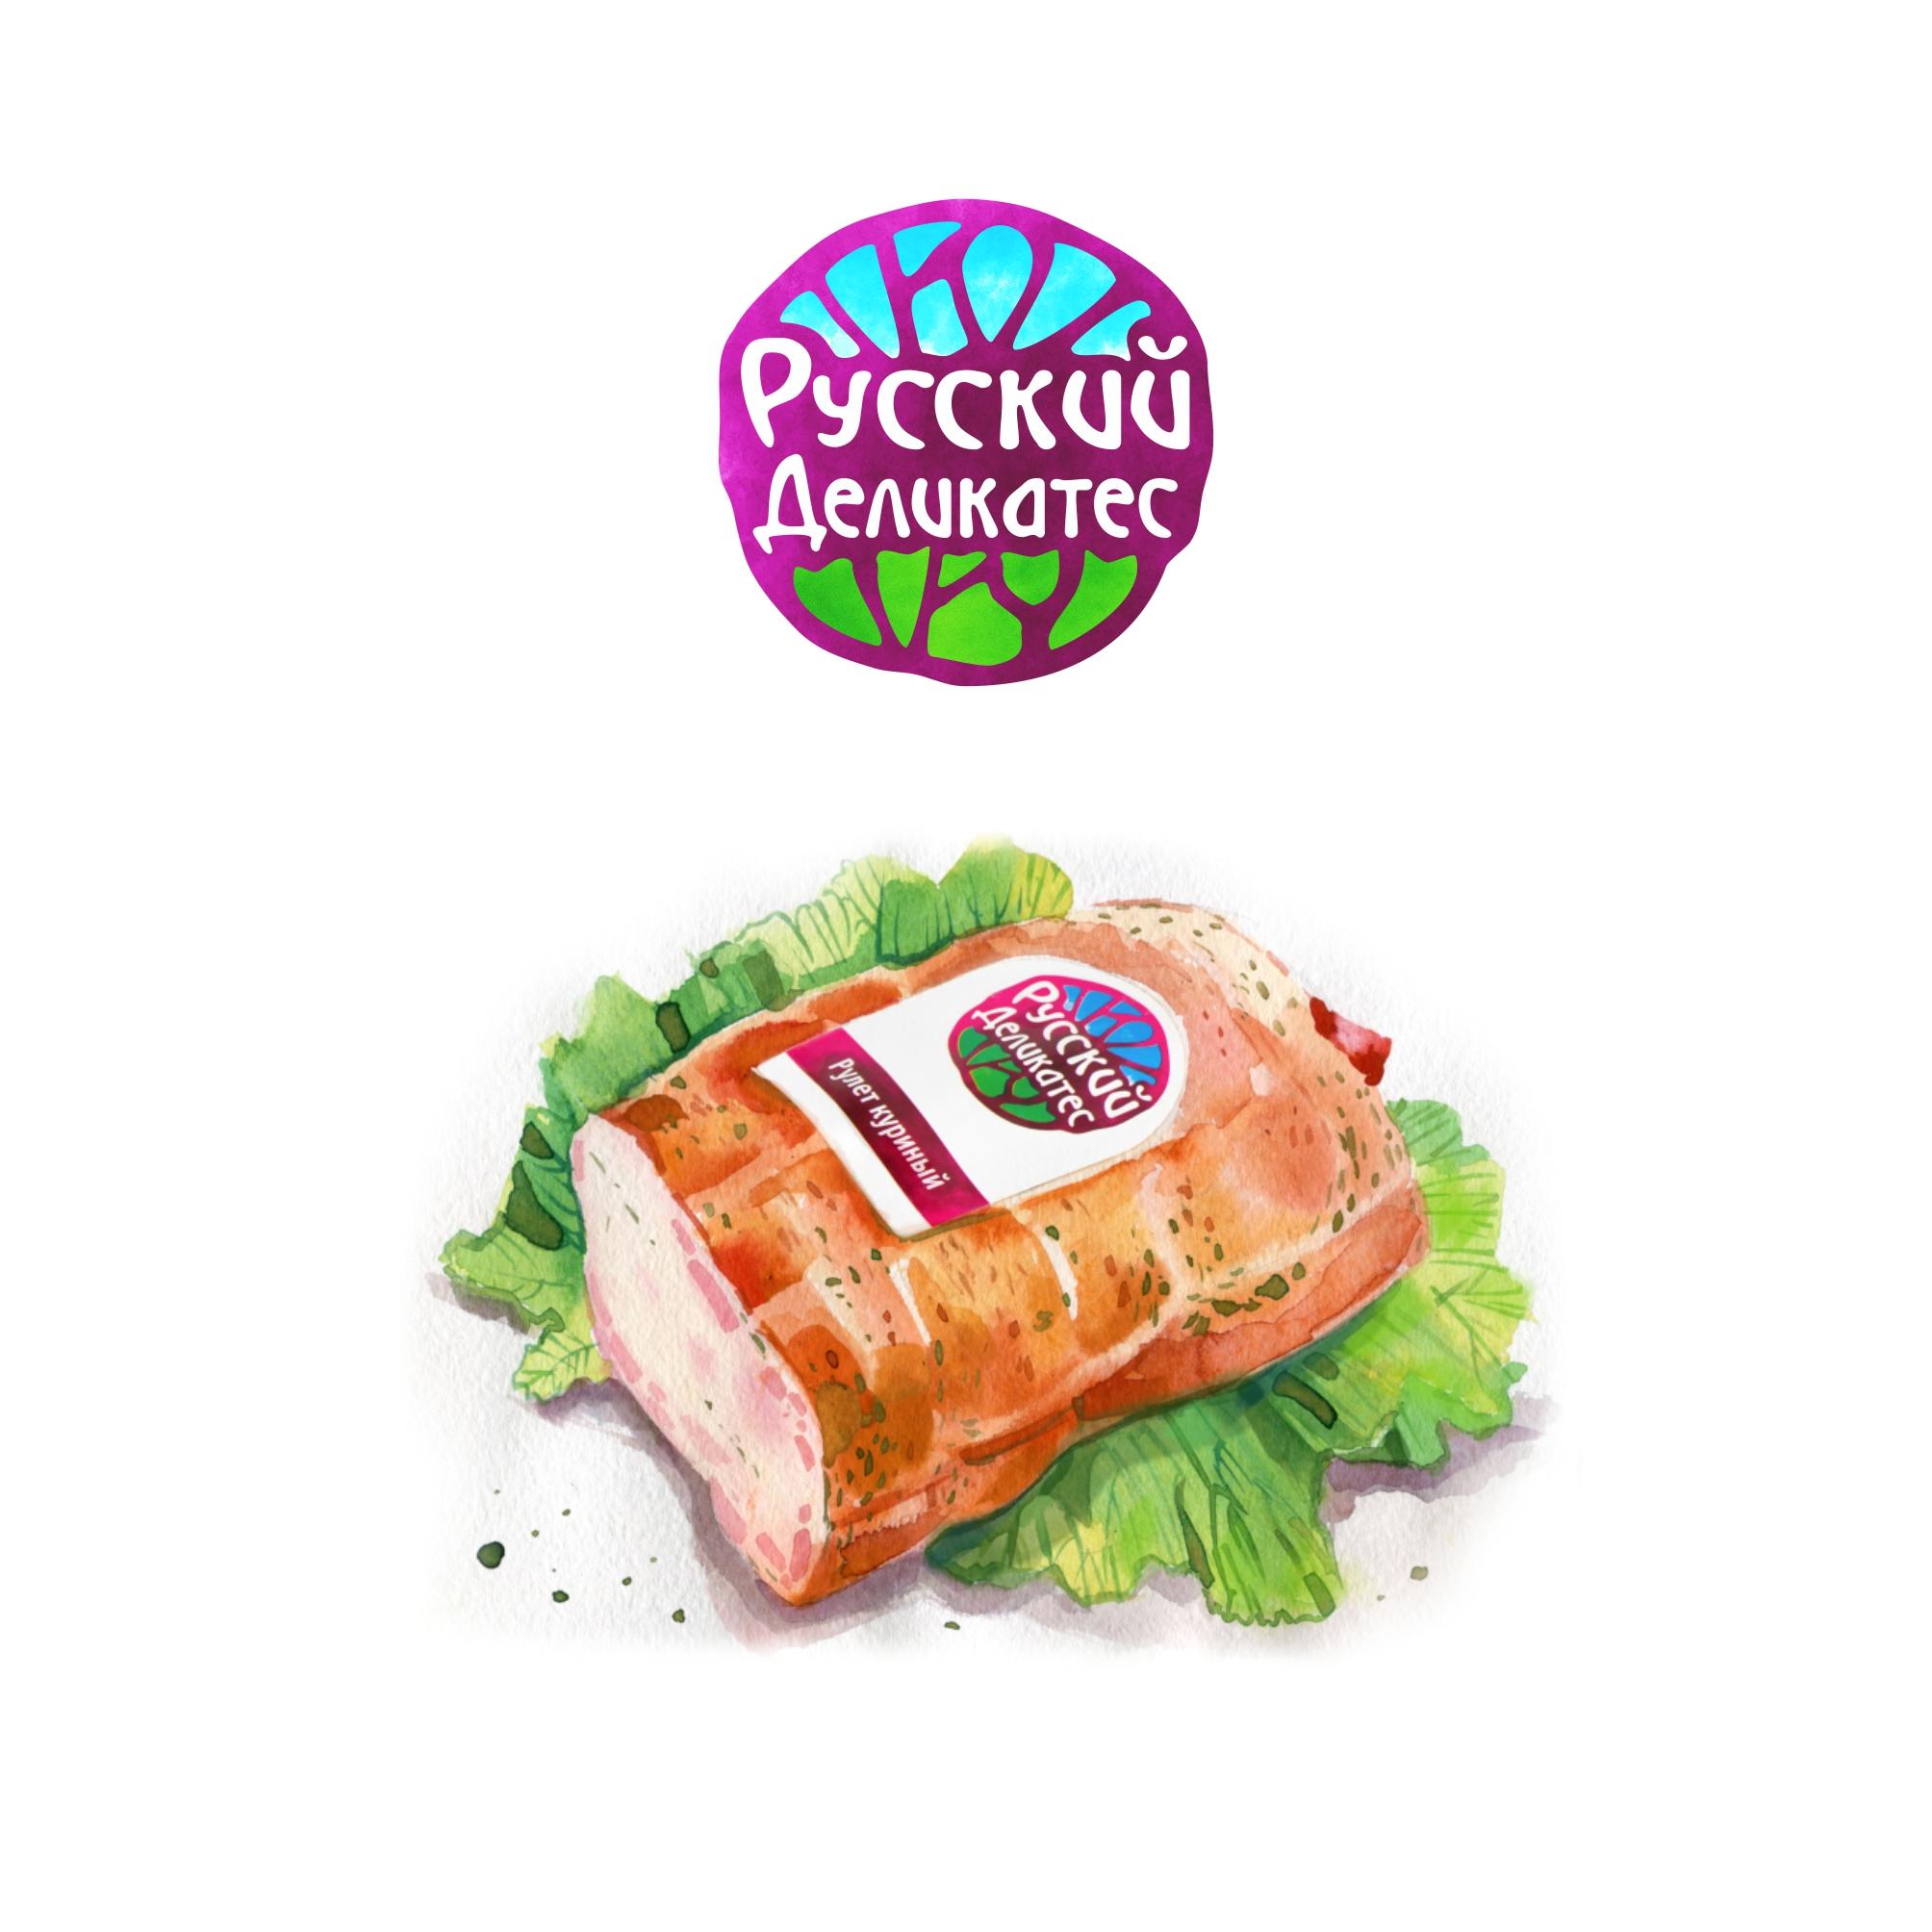 russkiy delikates_1